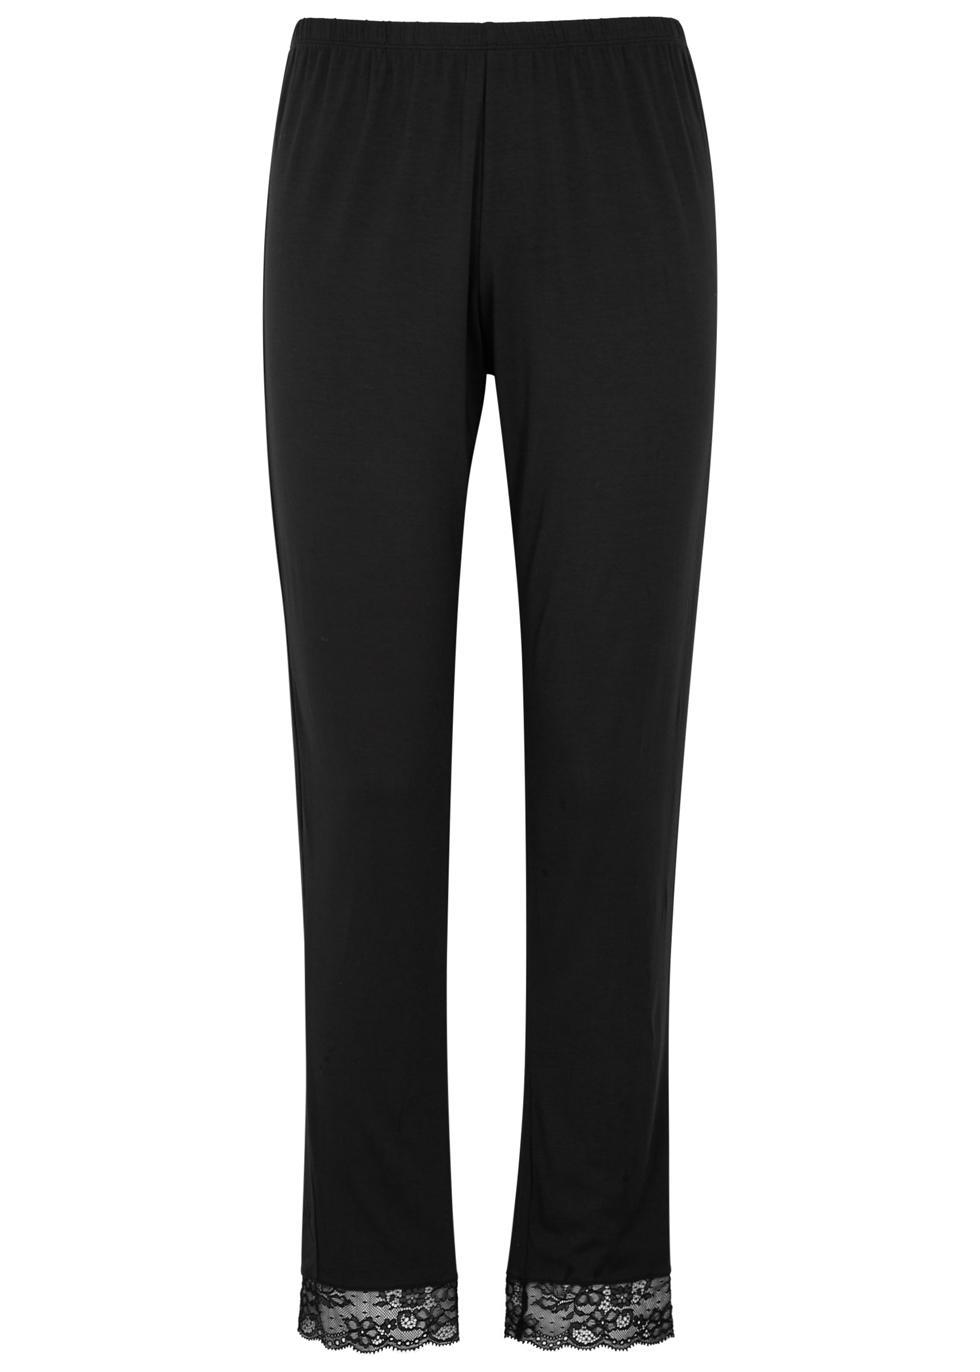 3db598ffd8 Designer Sleepwear - Luxury Lingerie - Harvey Nichols